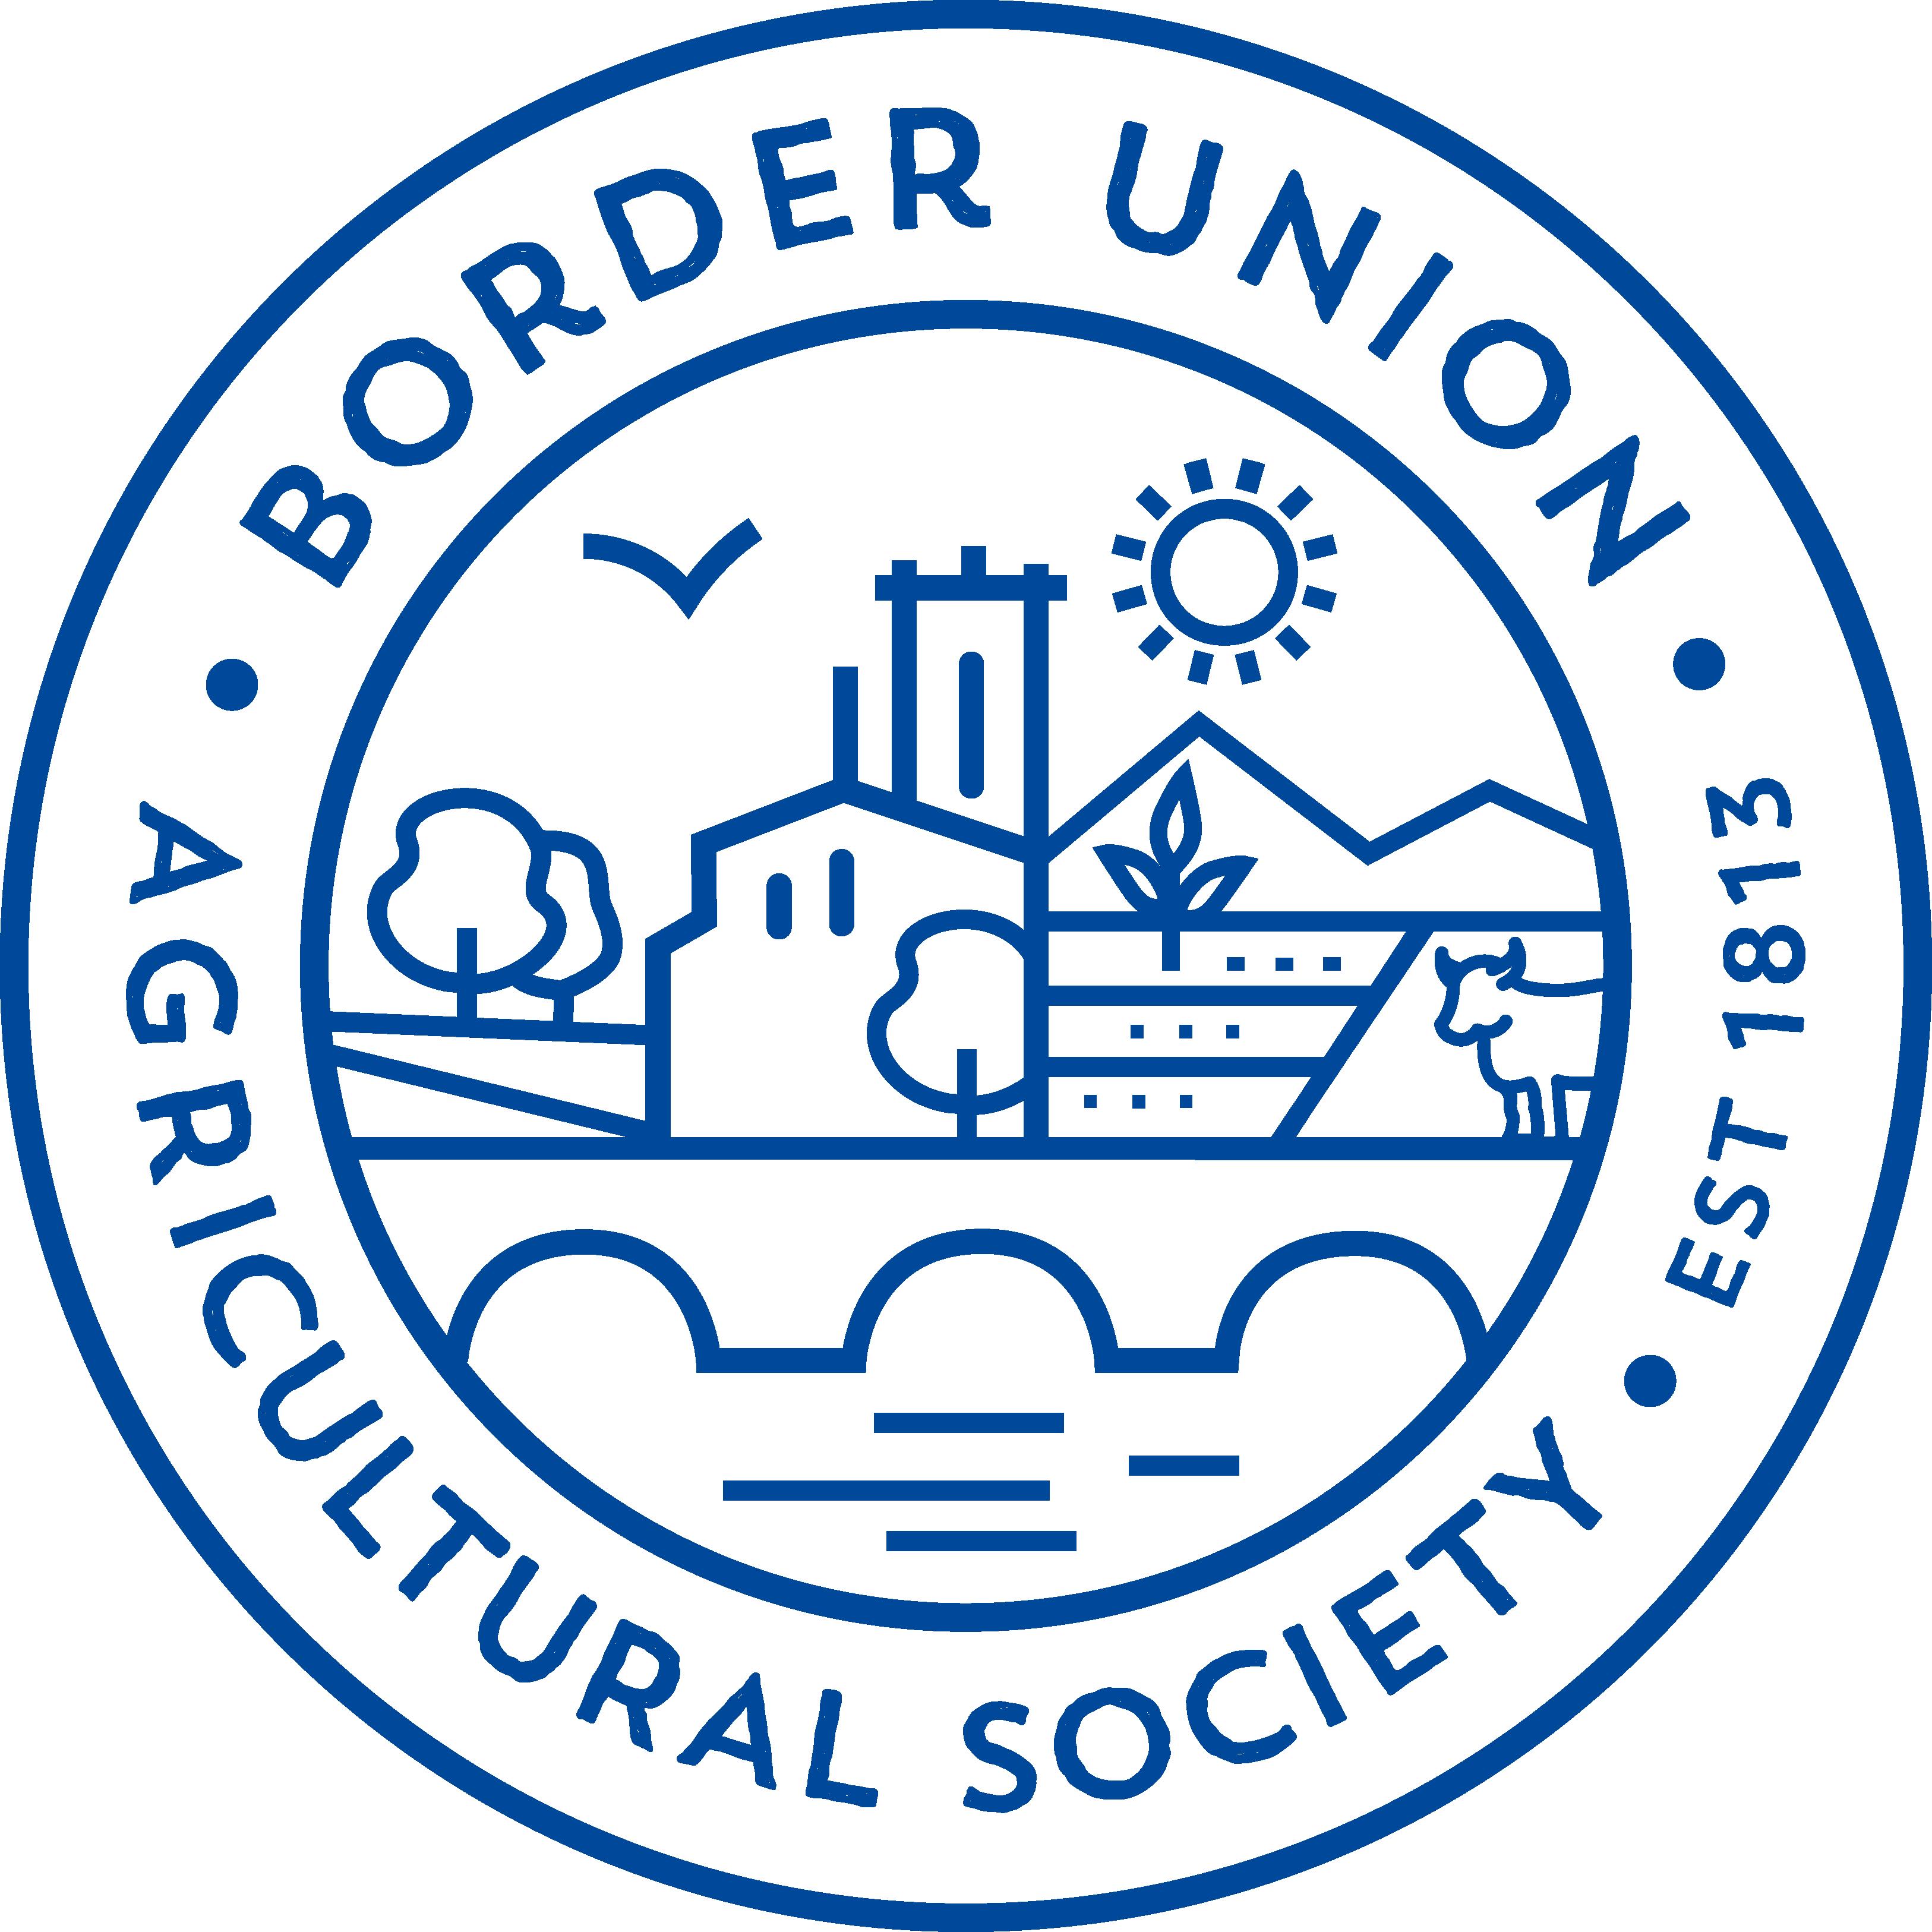 024c8806 Border Union Ram Sales - Border Union Agricultural Society